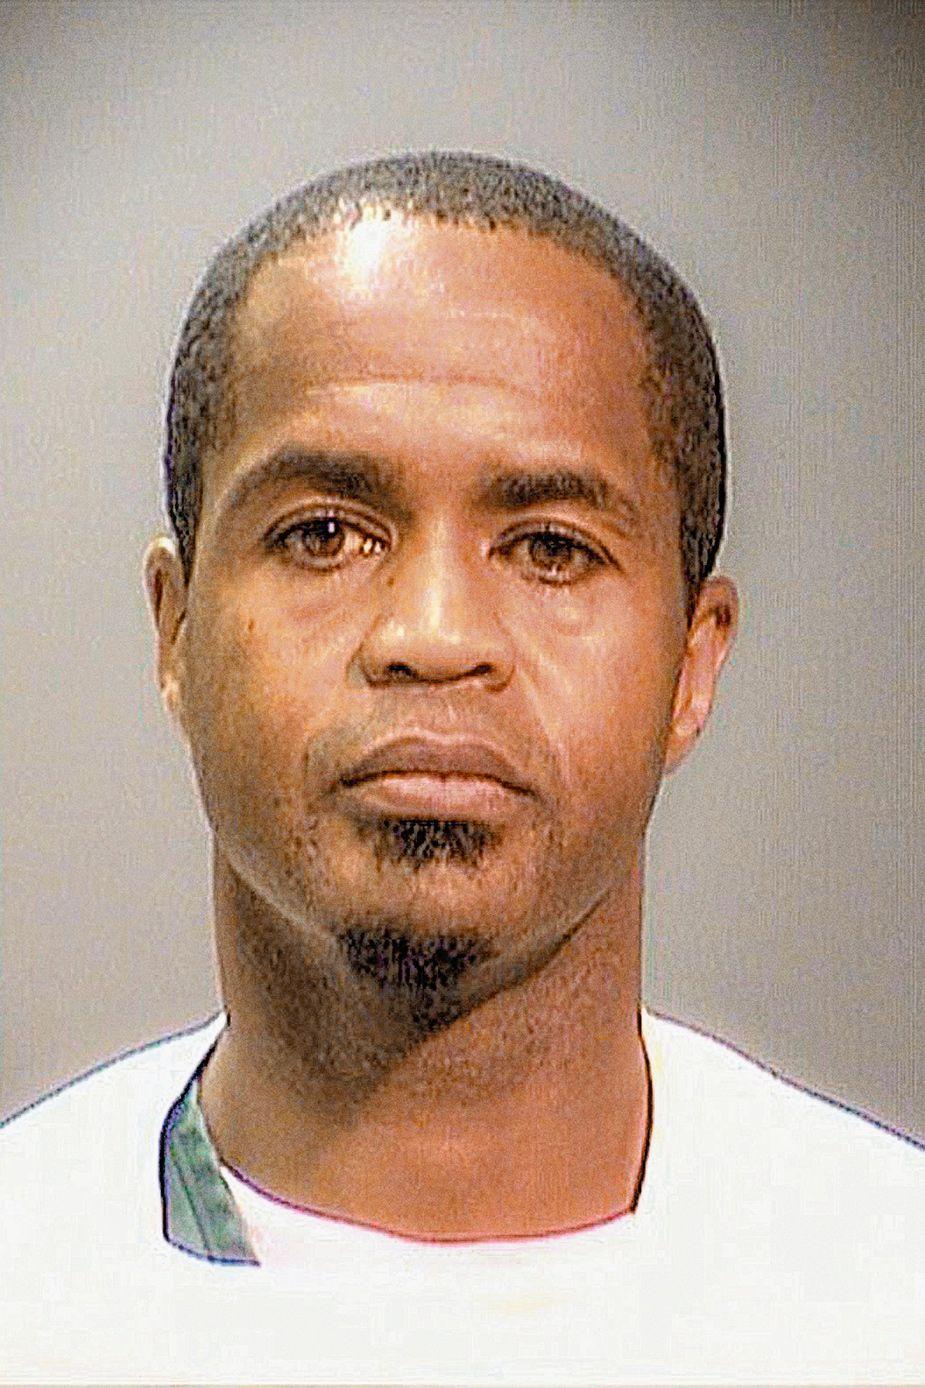 Suspect Harold Martin Smith.